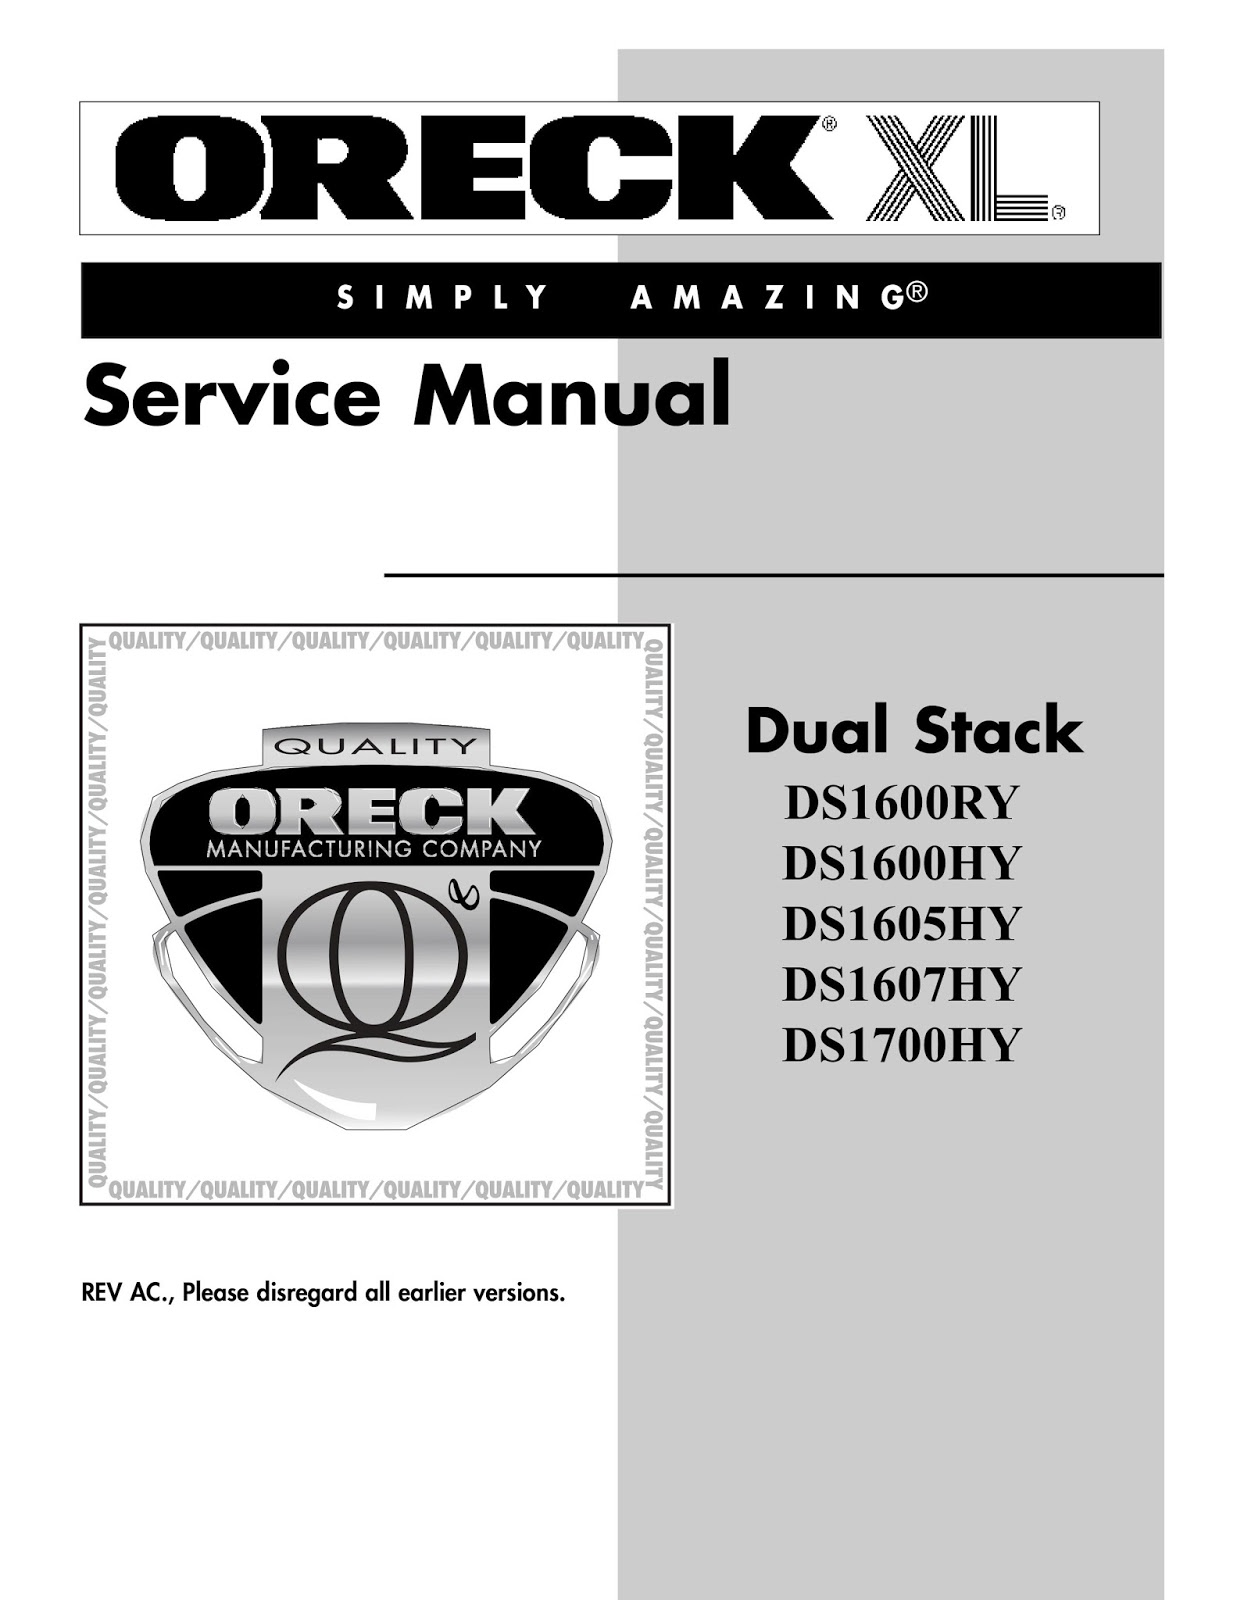 Oreck Dual Stack